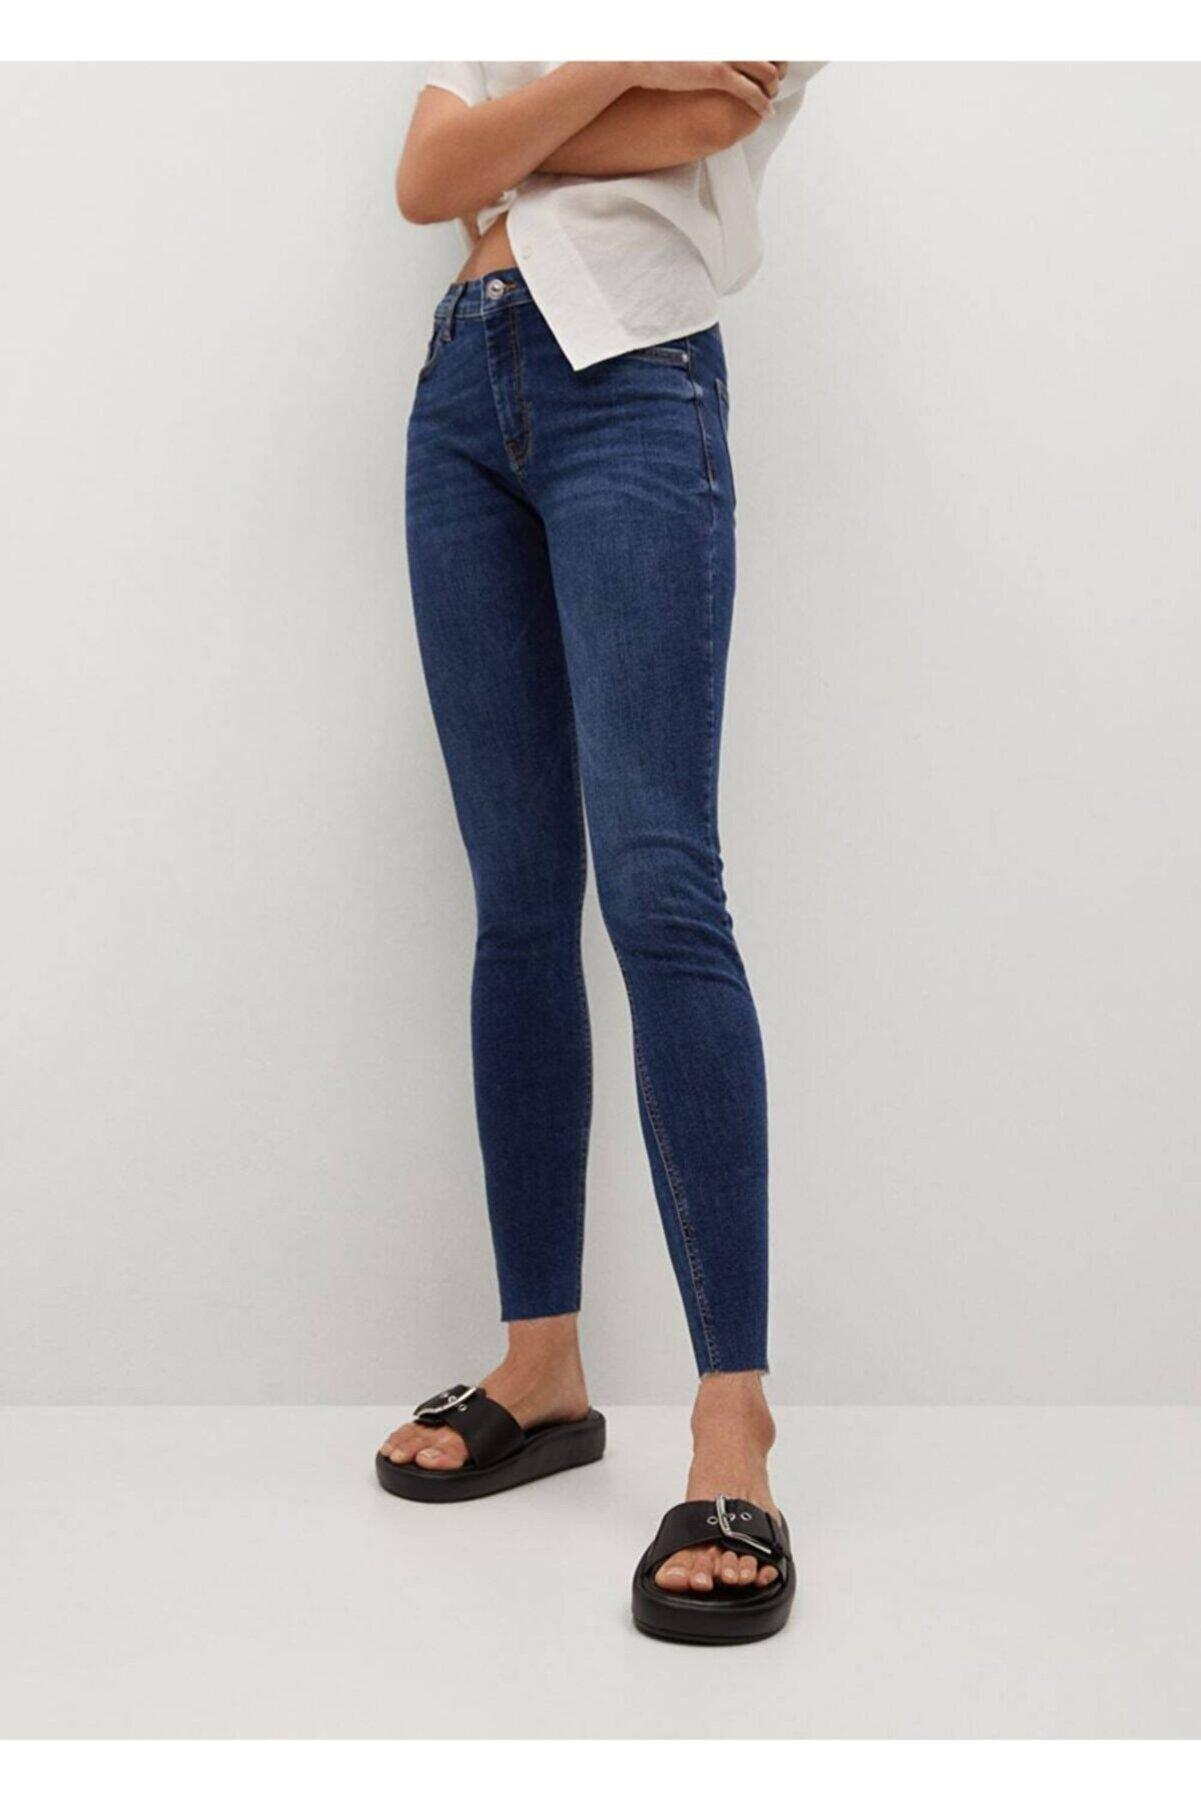 Mango Kadın Koyu Mavi Kısa Paçalı Skinny Isa Jean Pantolon